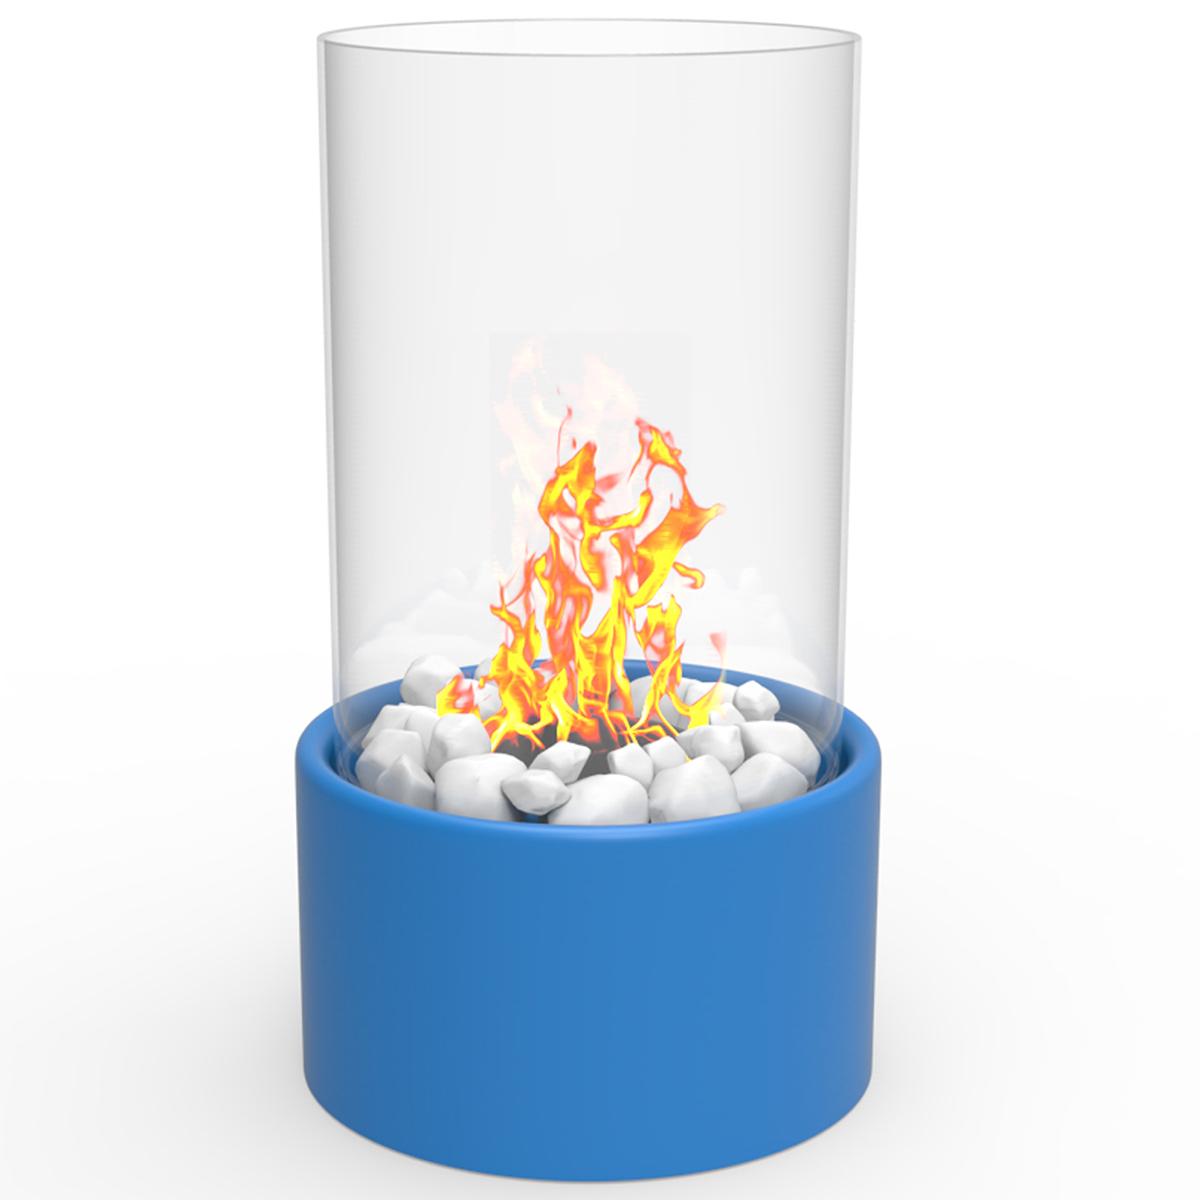 Eden Ventless Tabletop Portable Bio Ethanol Fireplace In Blue